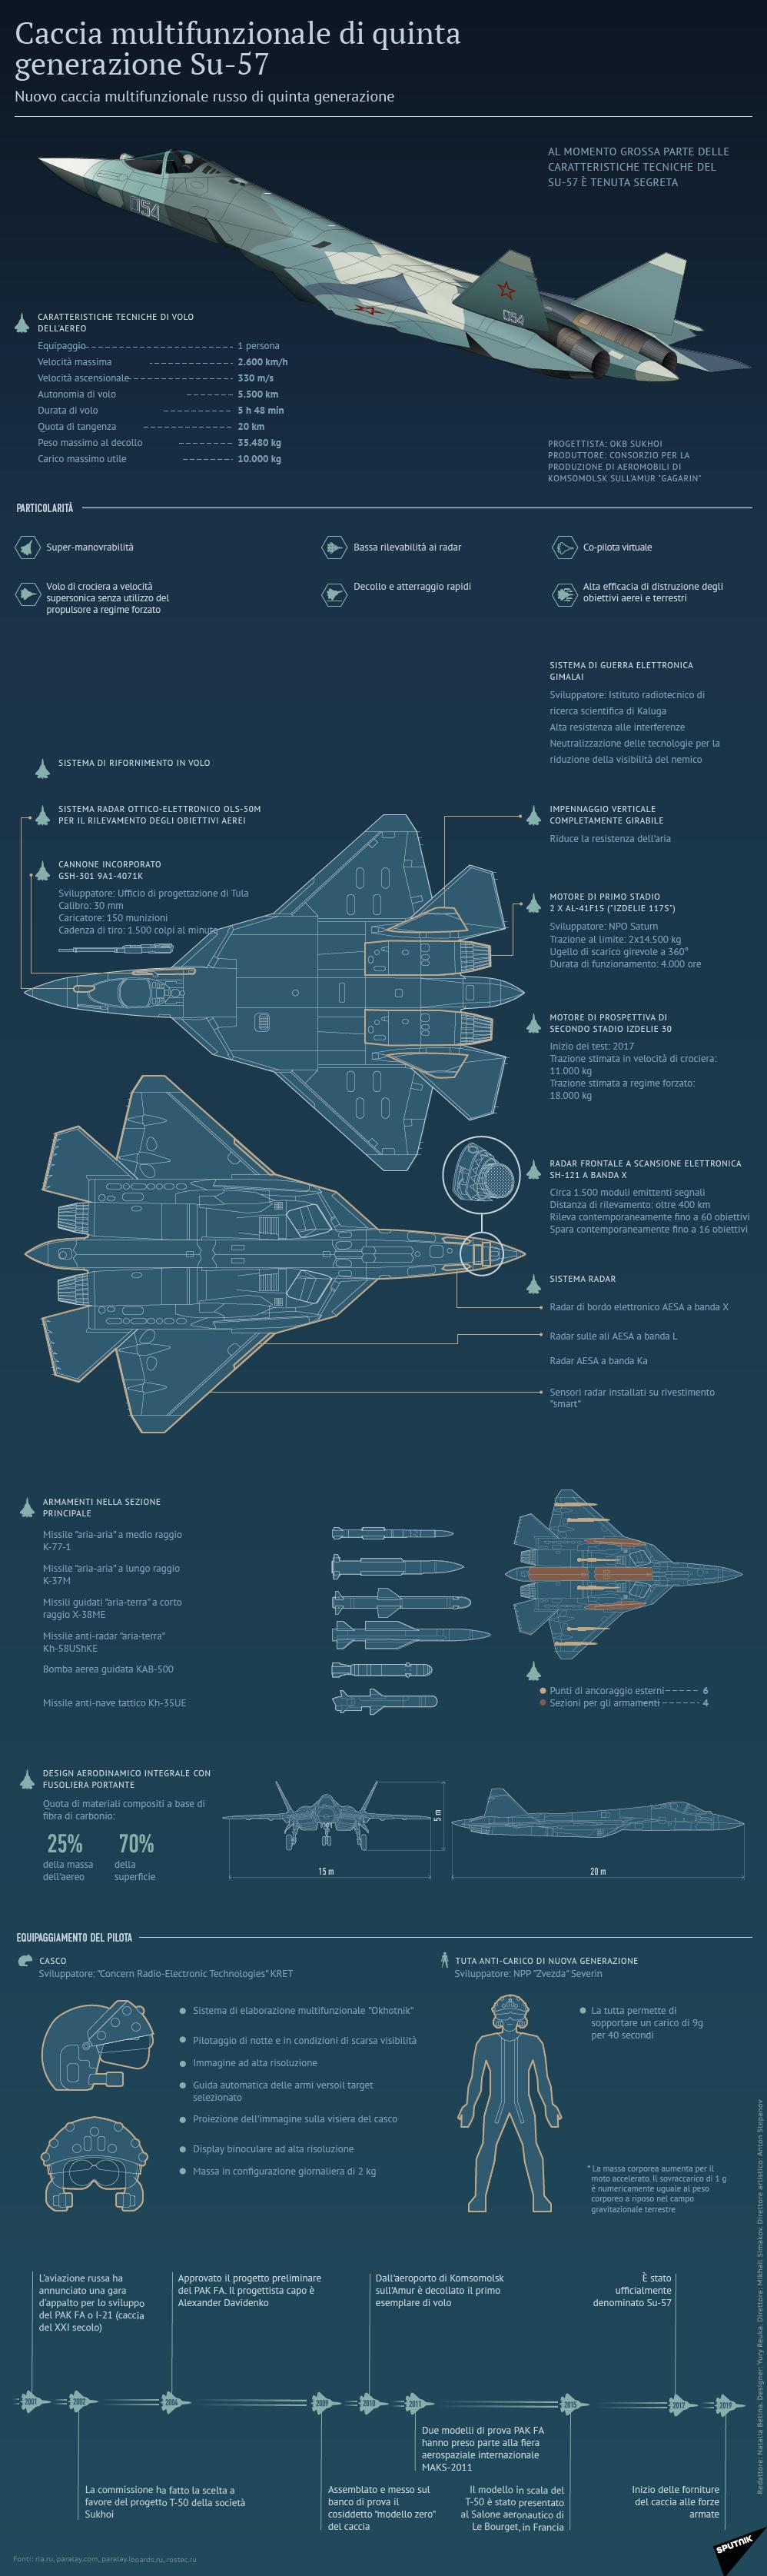 Caccia multifunzionale di quinta generazione Su-57